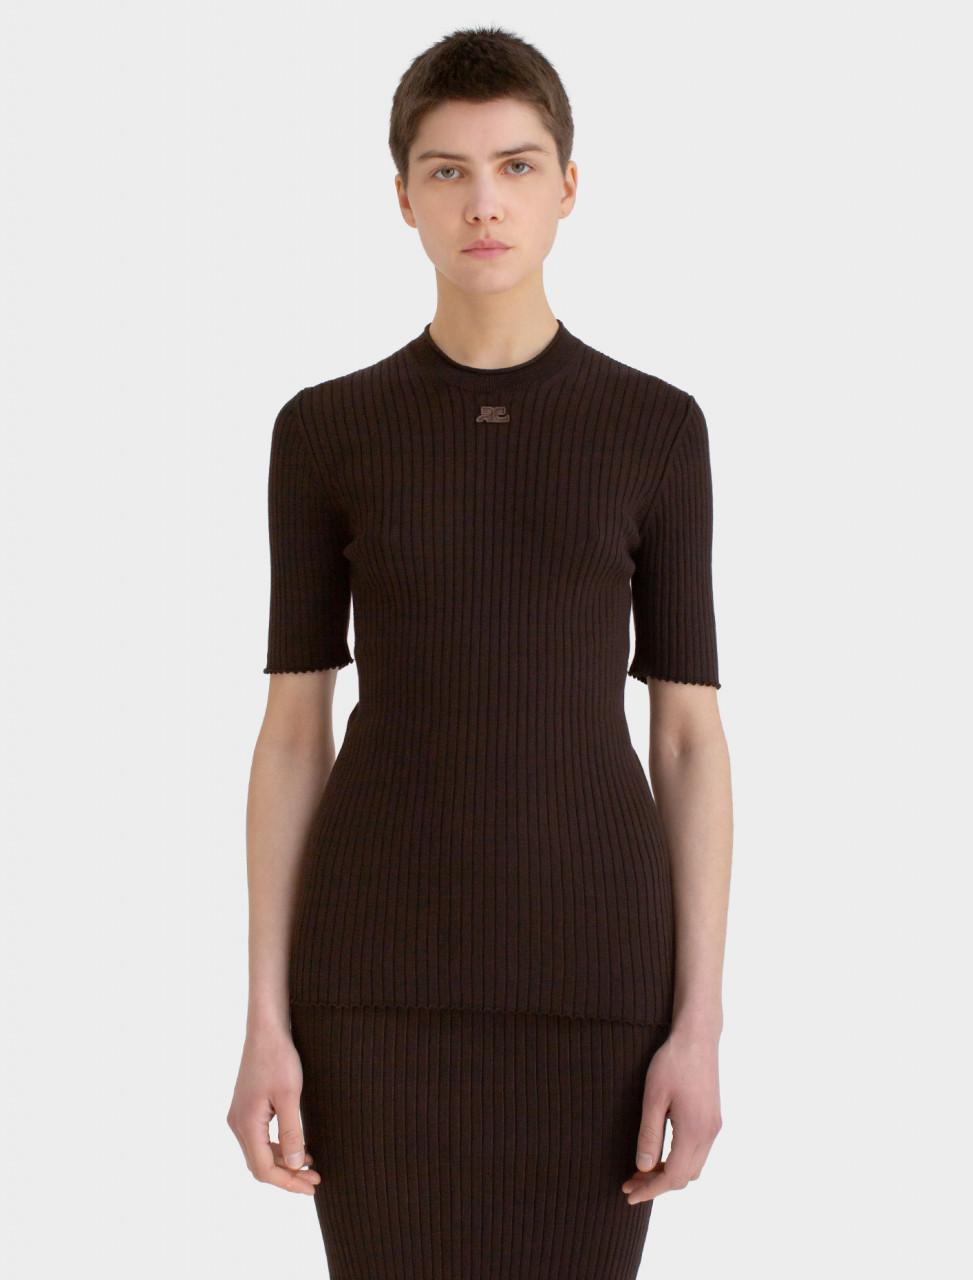 Short Sleeve Crew Neck Sweater in Dark Brown